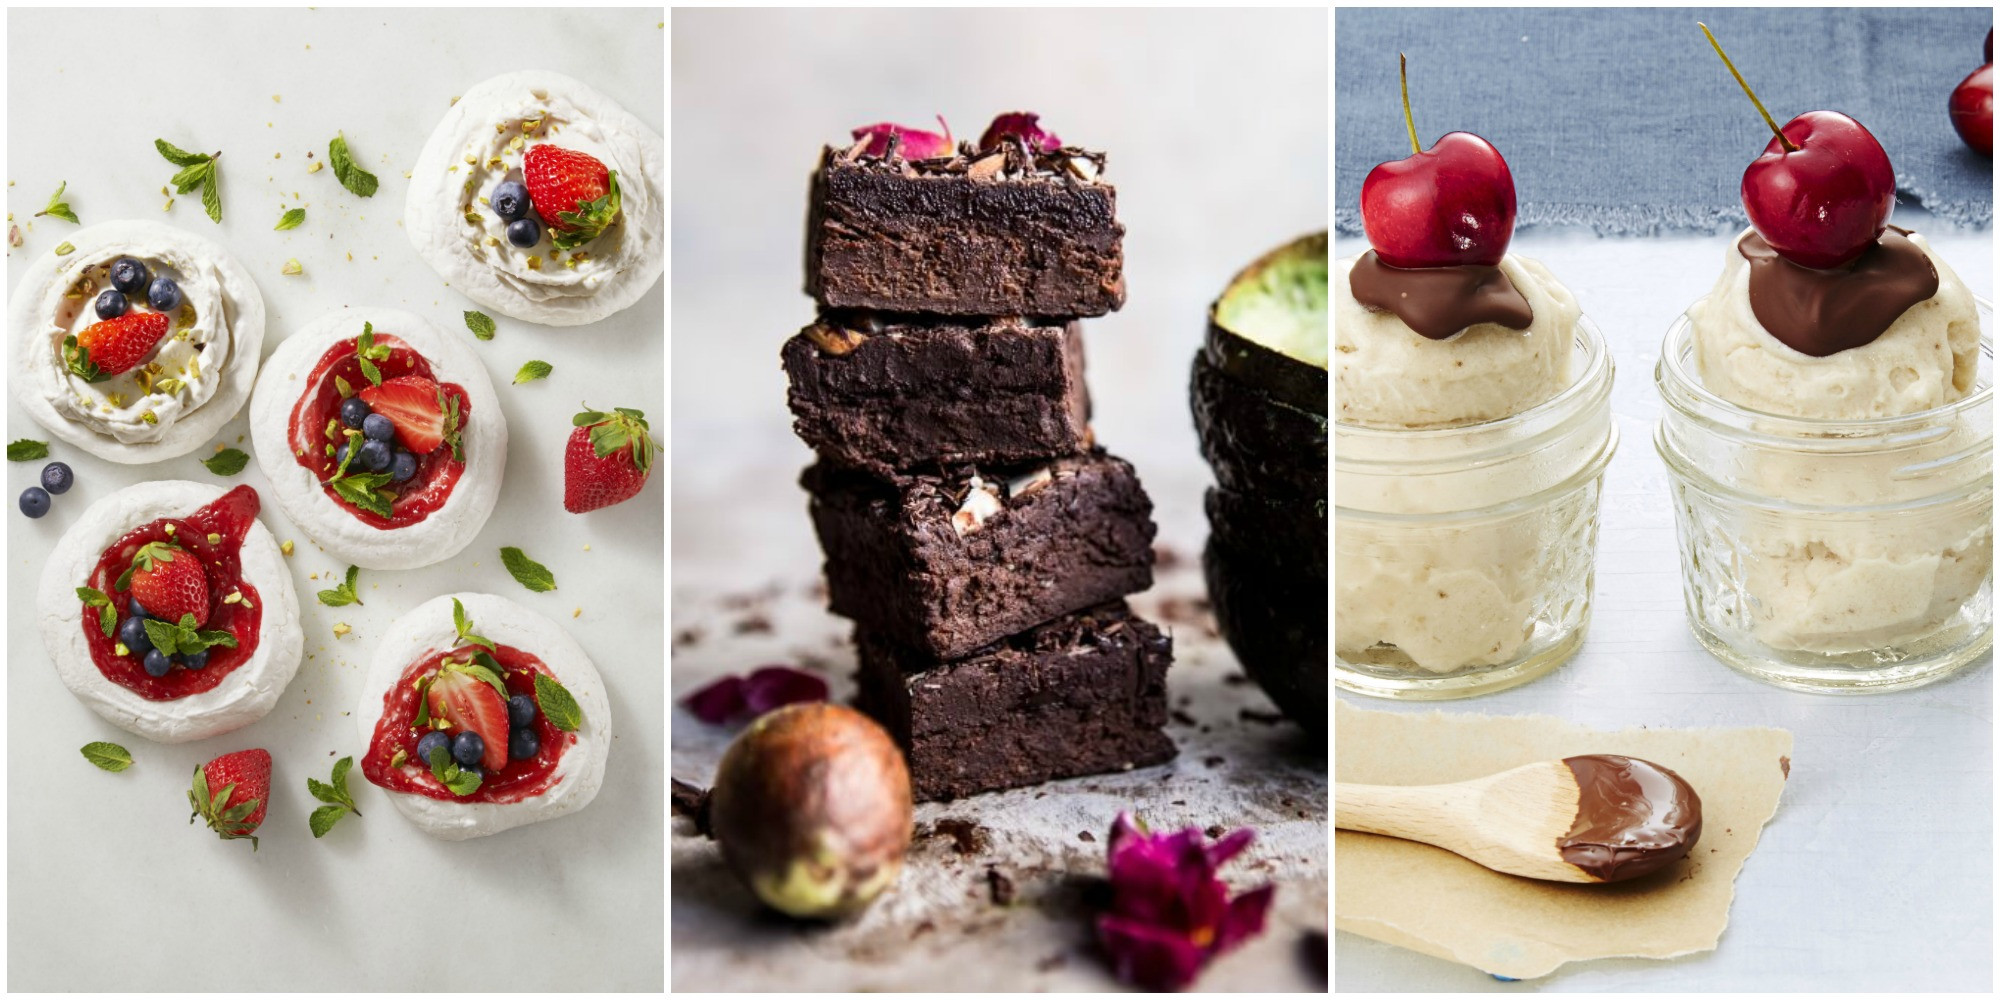 Easy Healthy Dessert  15 Best Healthy Dessert Recipes Easy Ideas for Low